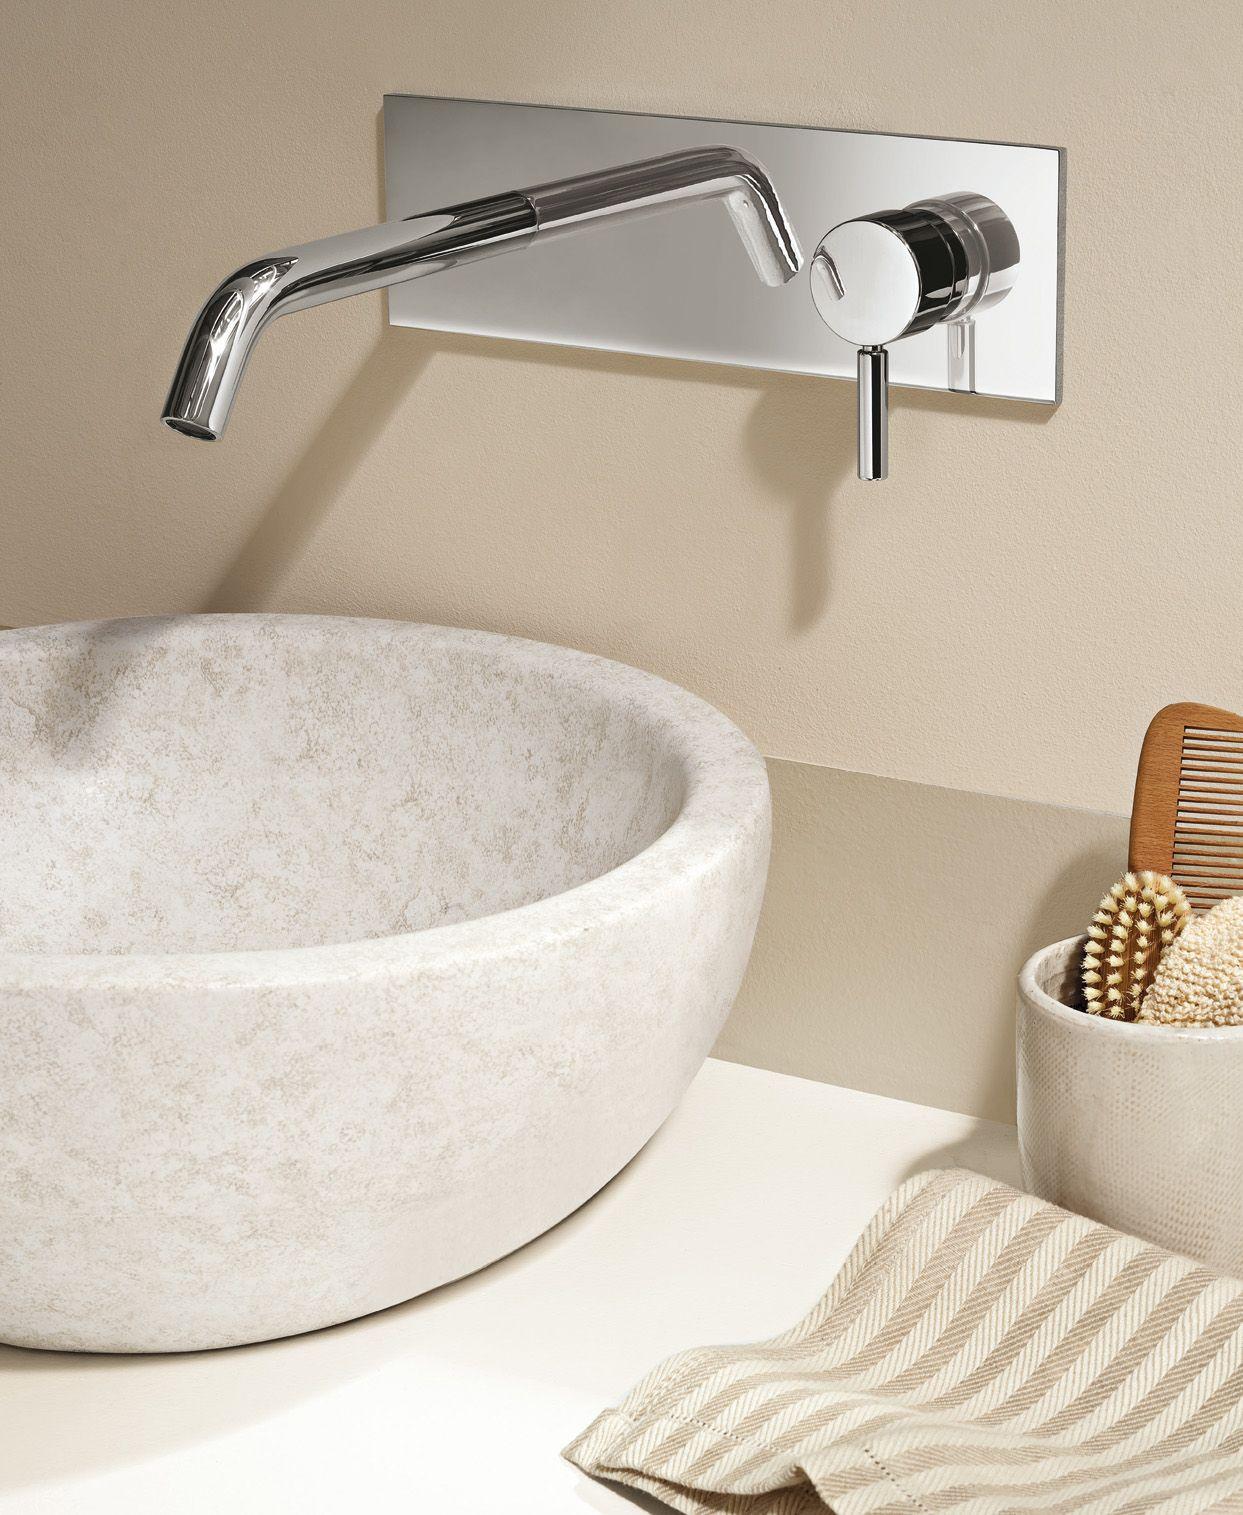 Nostromo collection by Fantini - #fantinirubinetti #fratellifantini #design #homeideas #bathroom #interiorinspiration #lavandino